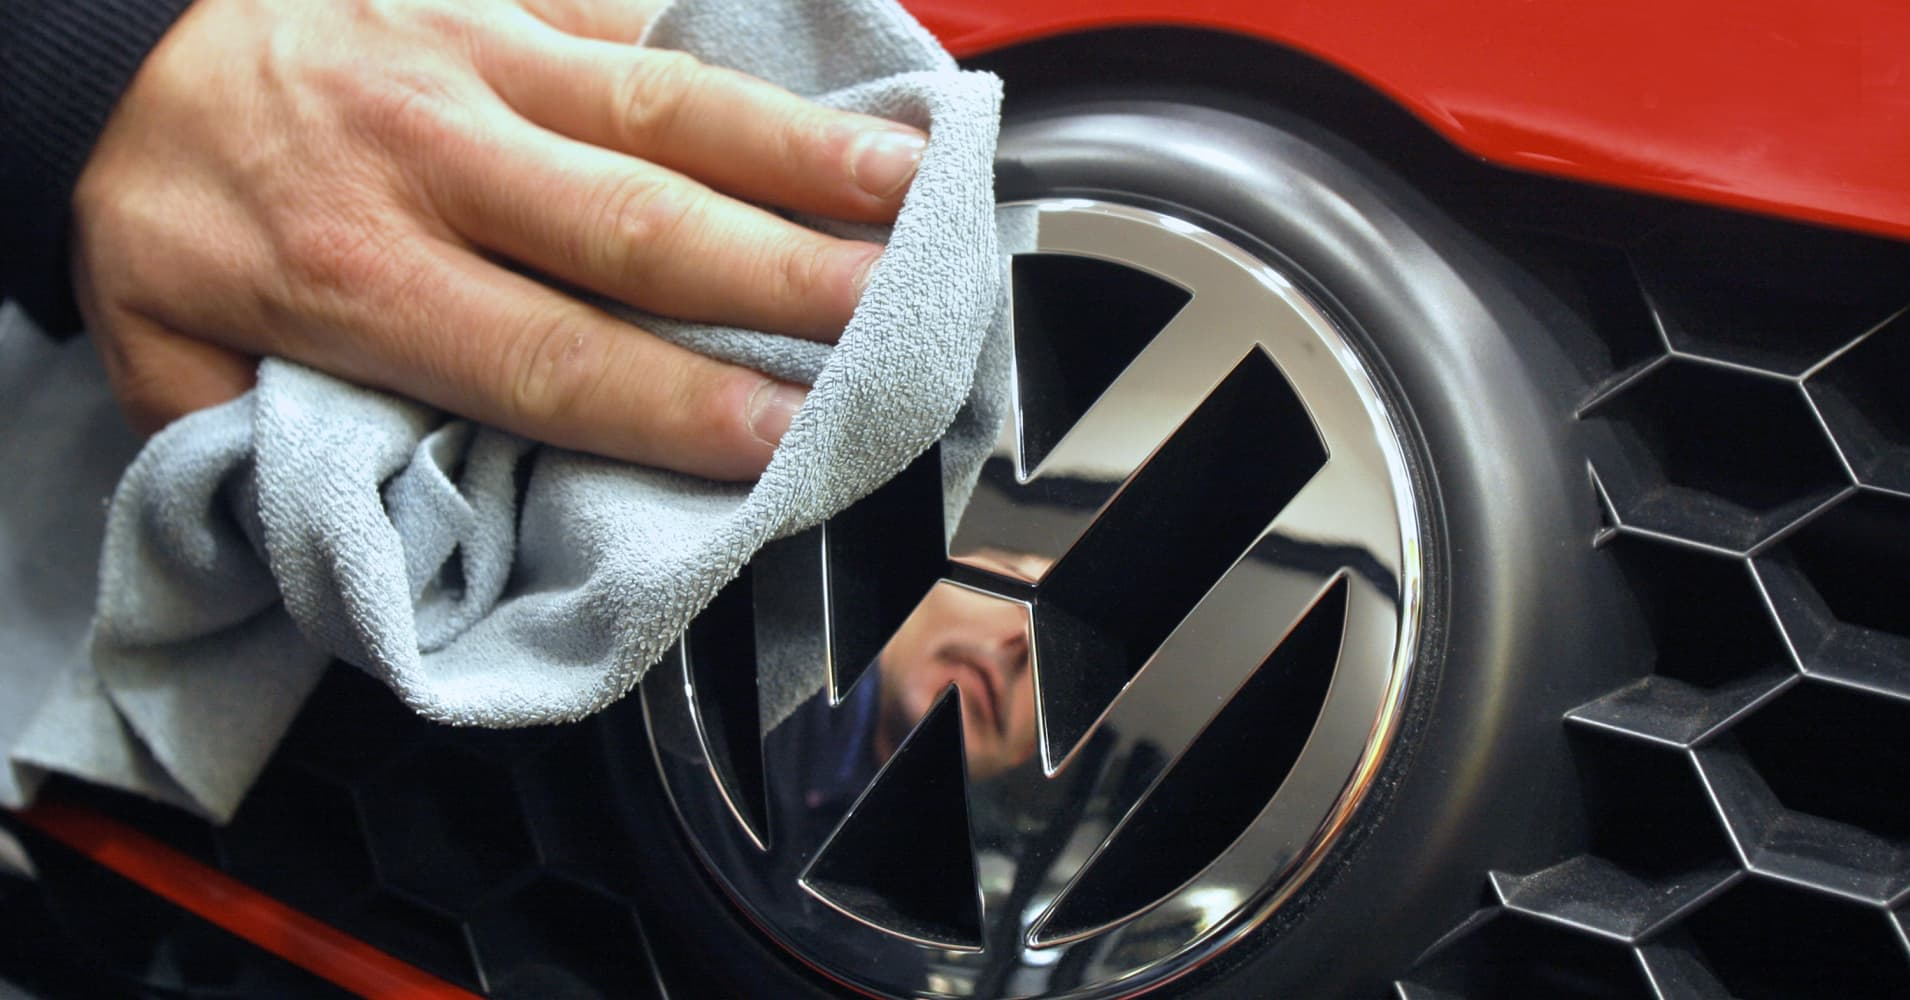 cnbc.com - Volkswagen to spend 44 billion euros on electric, autonomous cars by 2023